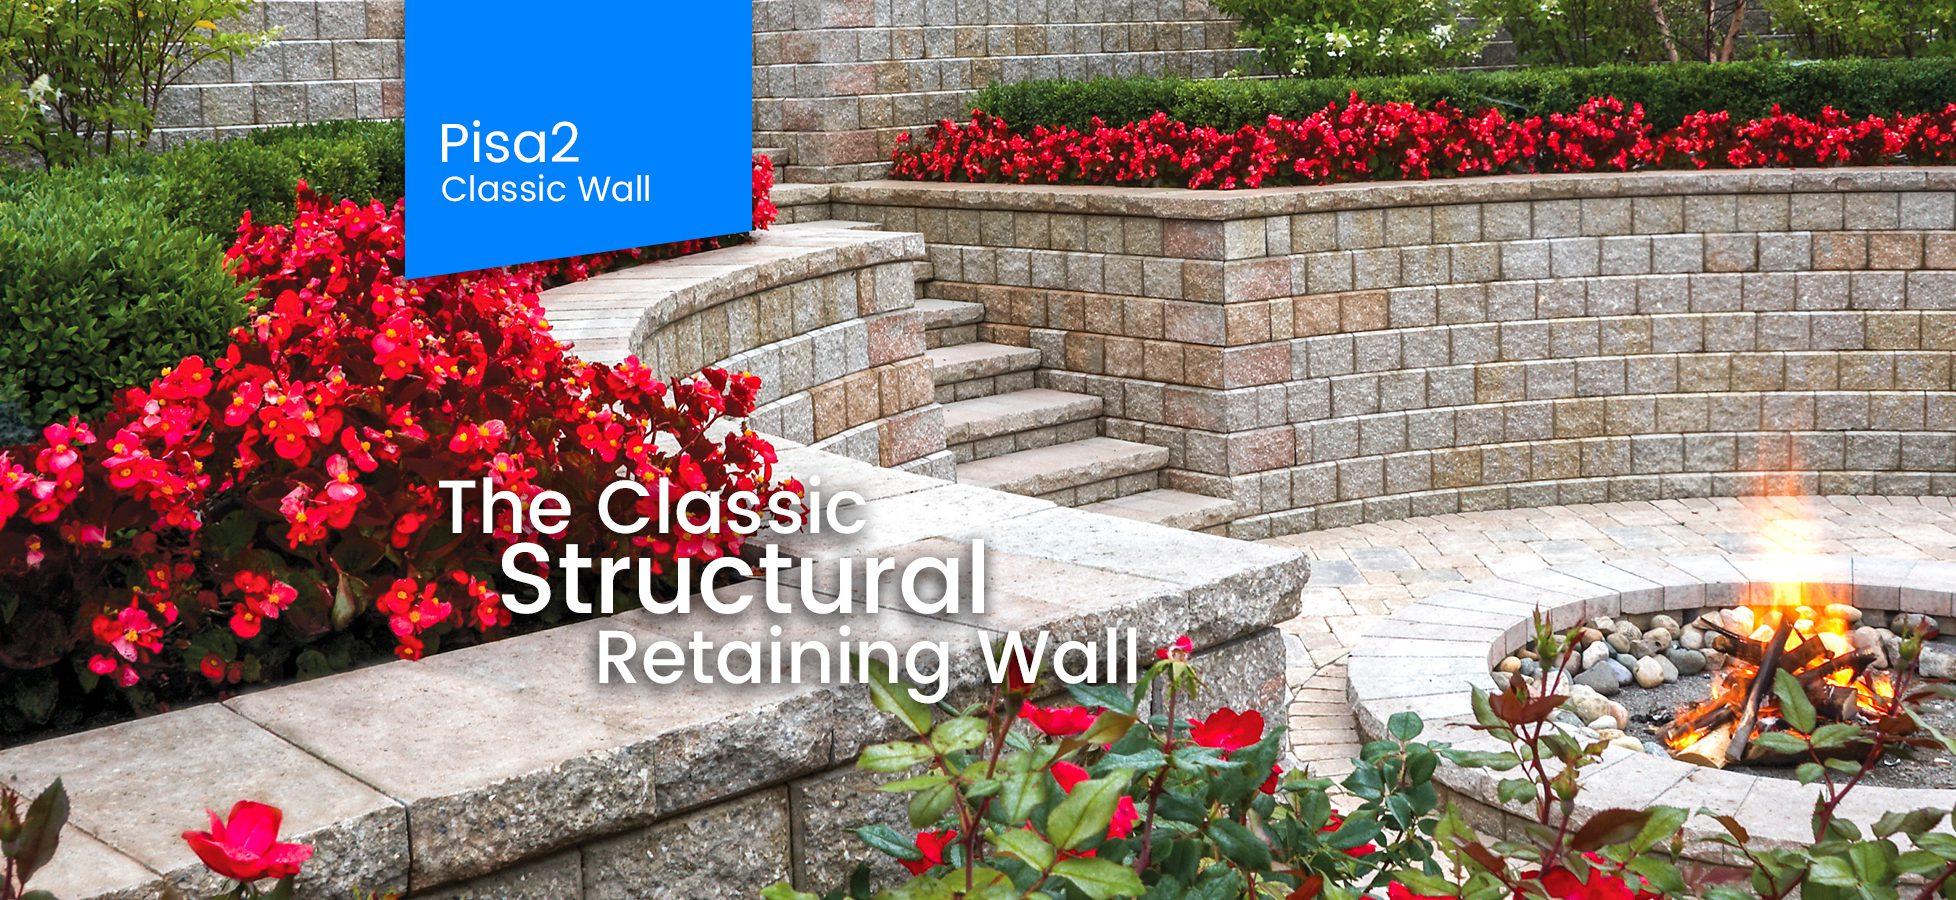 pisa2 classic wall